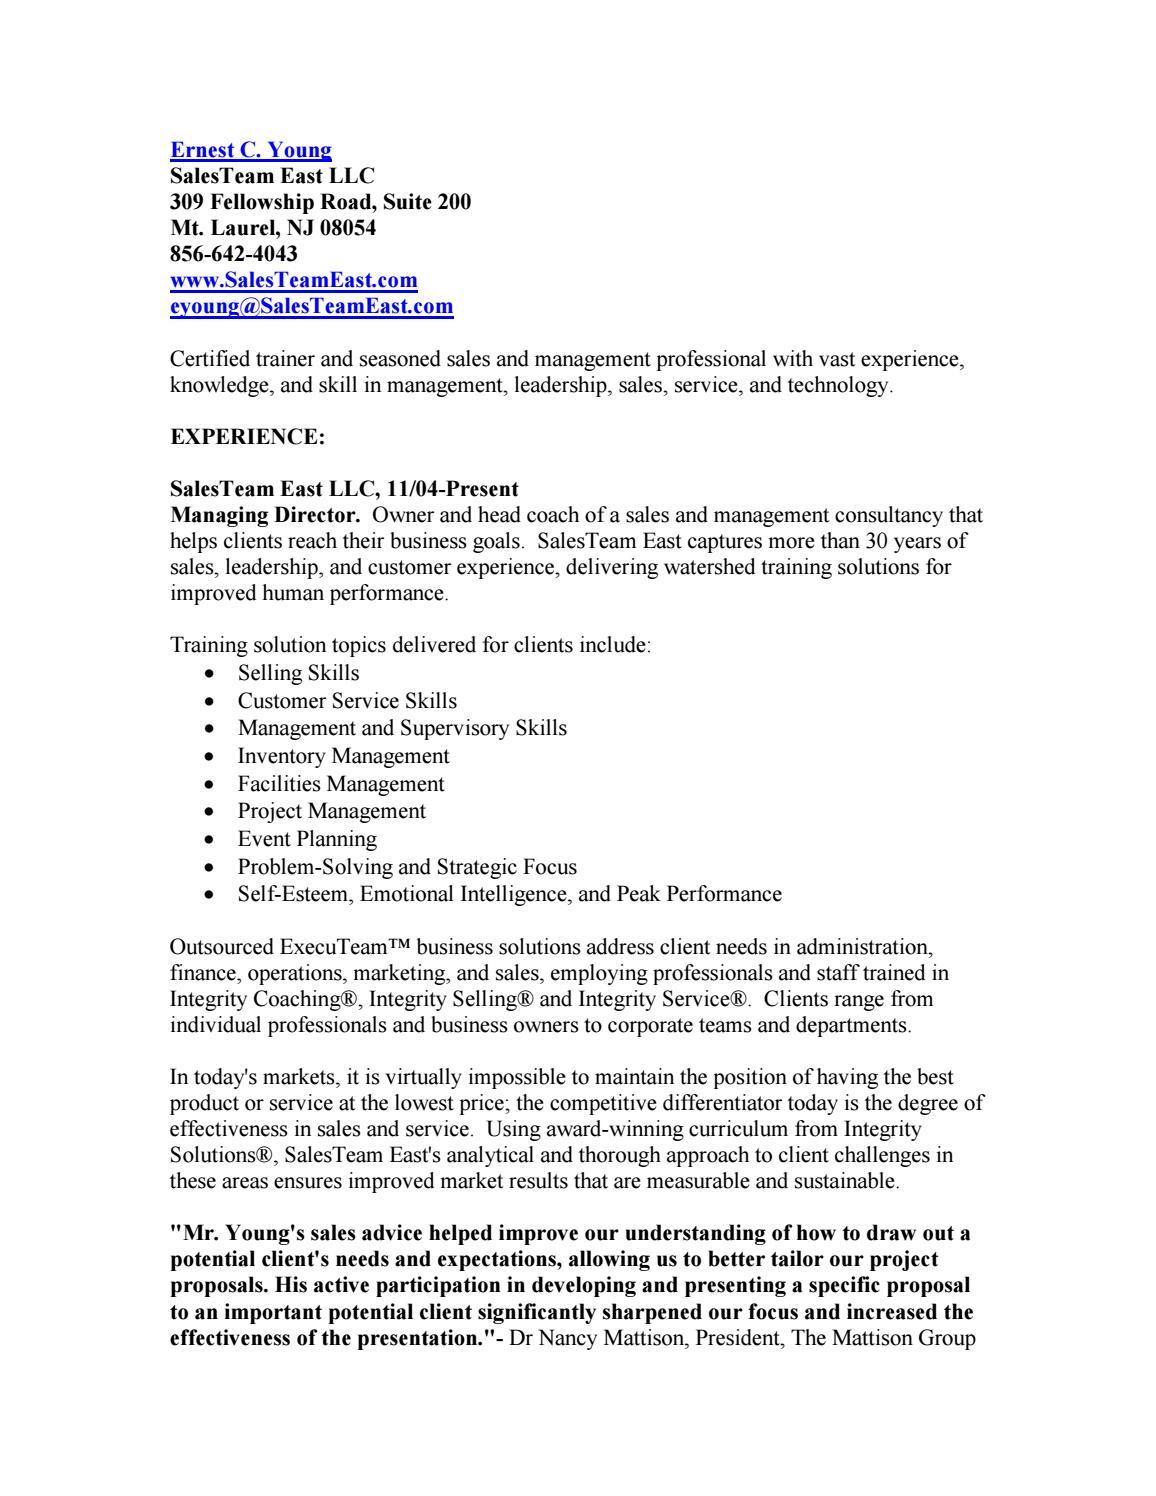 Resume%20xiv by SalesTeam East LLC - issuu